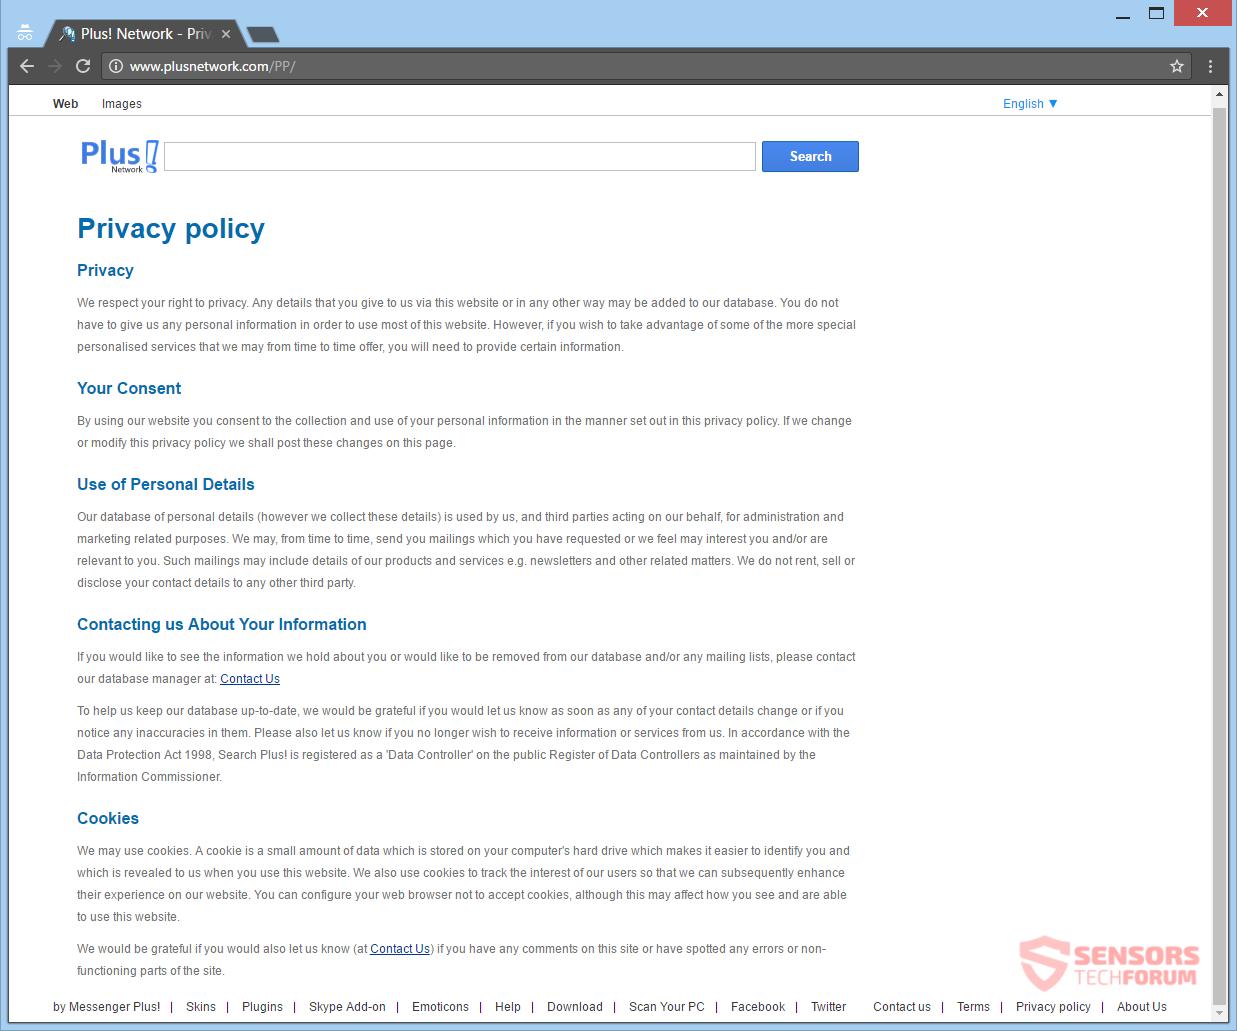 stf-webstarts-biz-web-starts-biz-browser-hijacker-redirect-plus-network-privacy-policy